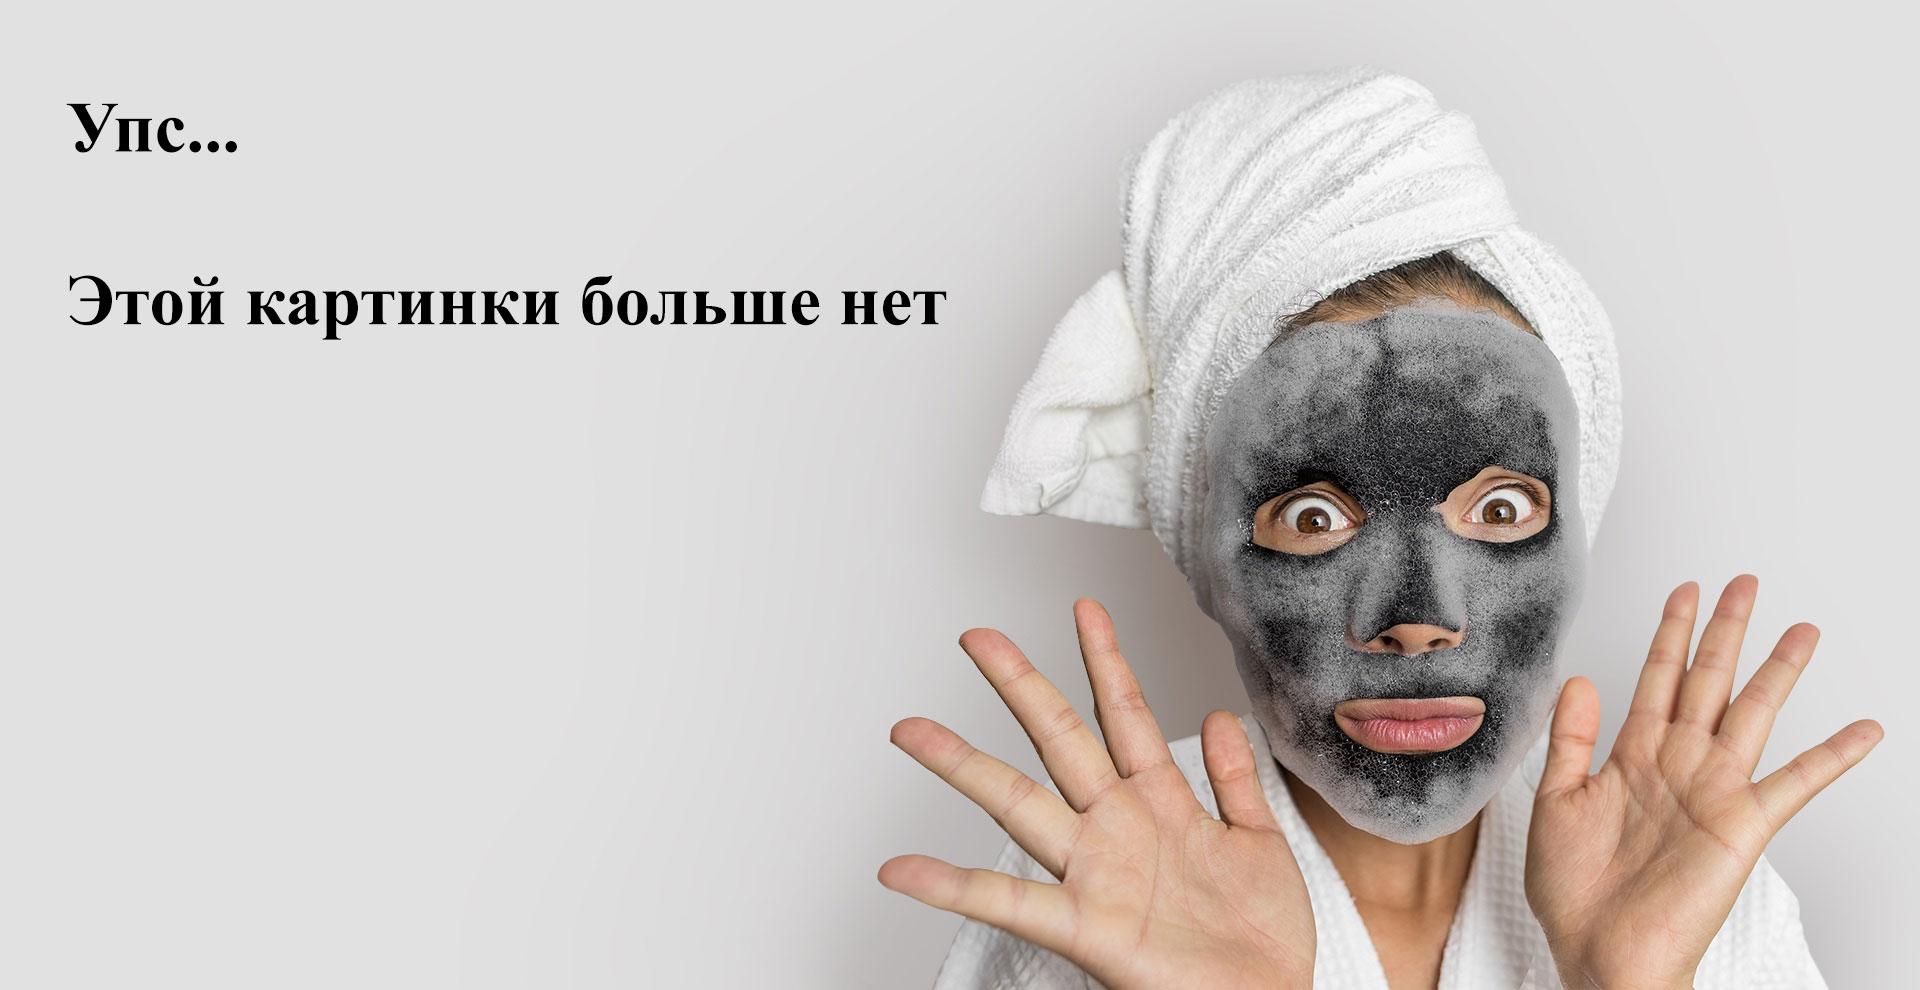 Patrisa Nail, Гель-лак Московская сага №742